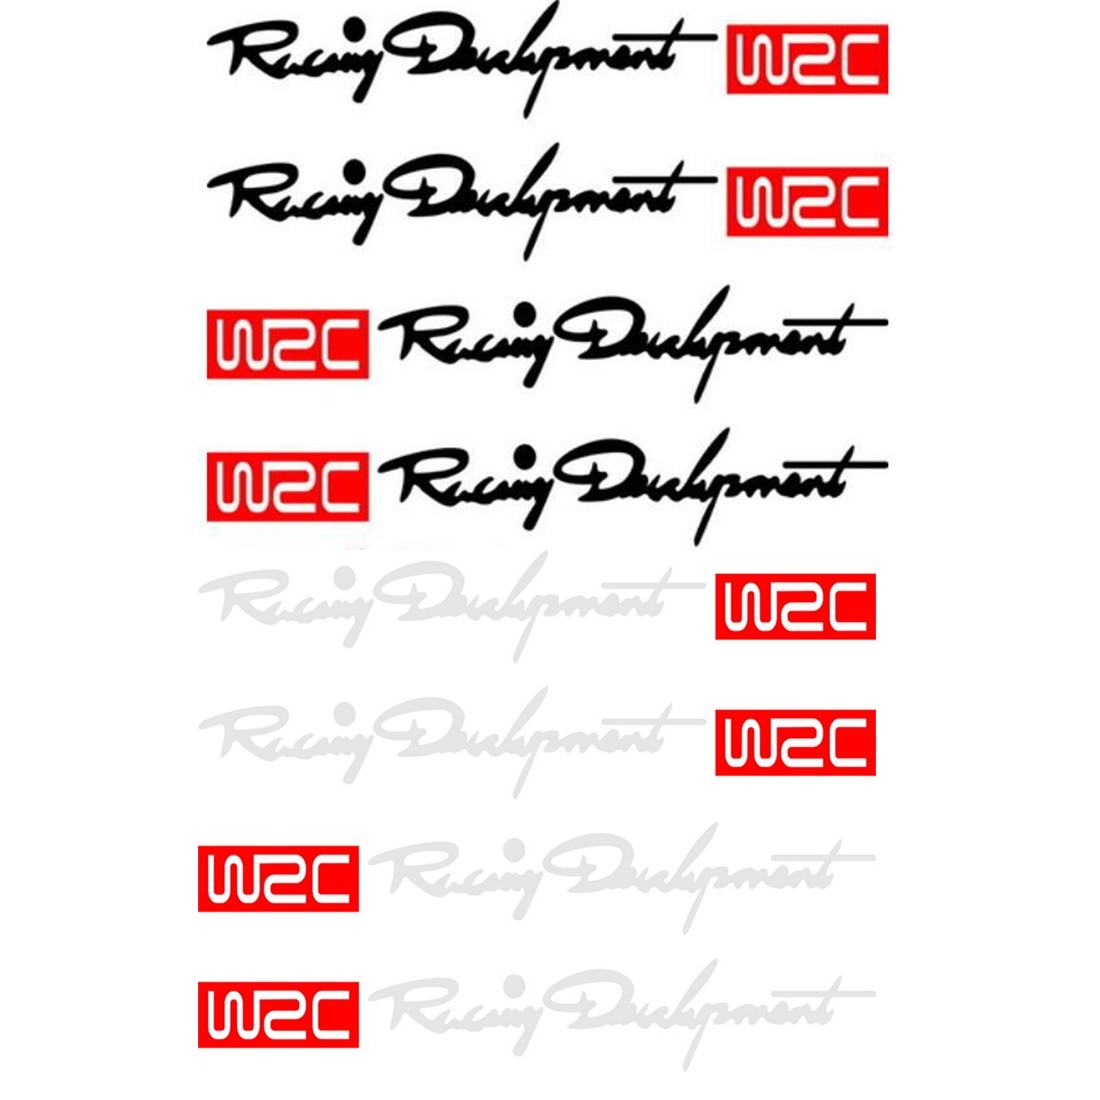 Dewtreetali Heißer Verkauf WRC Racing Türgriff Aufkleber Decals Für BMW MINI Audi VW Volkswagen Skoda Peugeot Citroen Renault 4 pcs/s